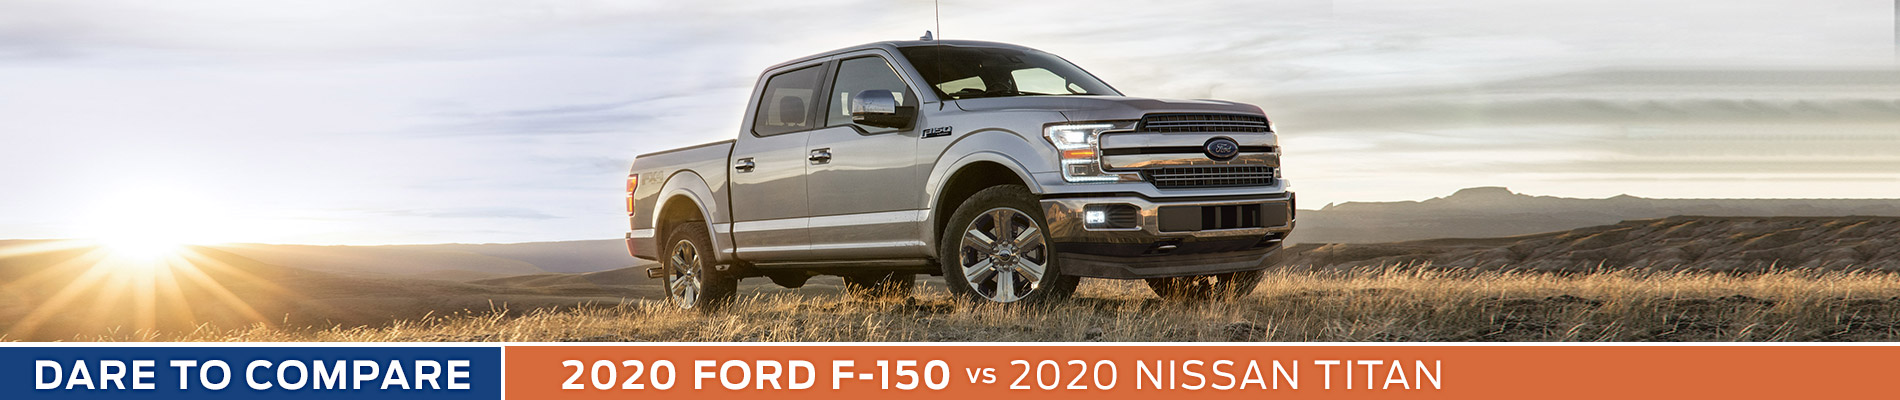 2020 Ford F-150 vs Nissan Titan - Sun State Ford - Orlando, FL